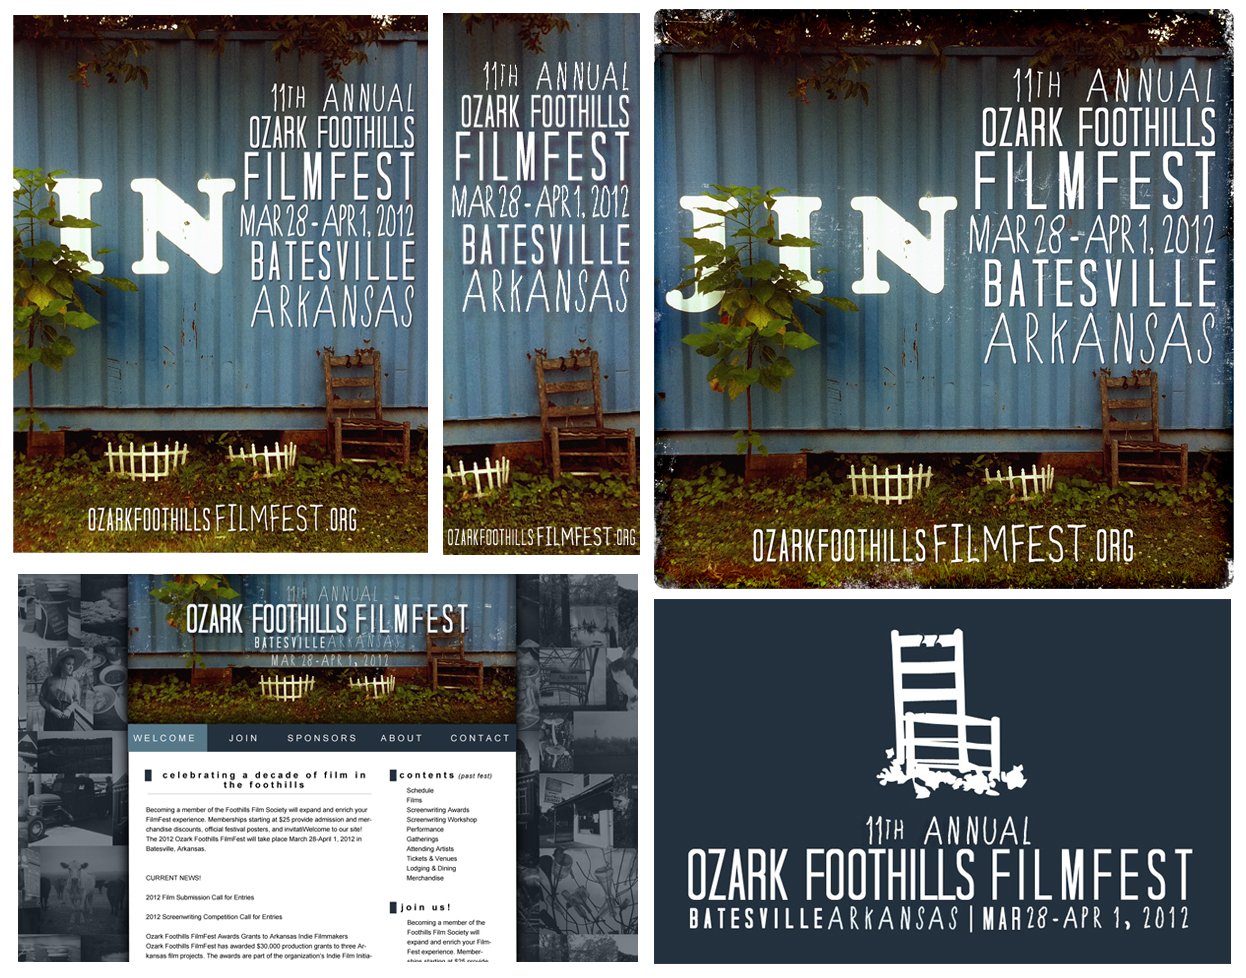 Ozark Foothills FilmFest Branding